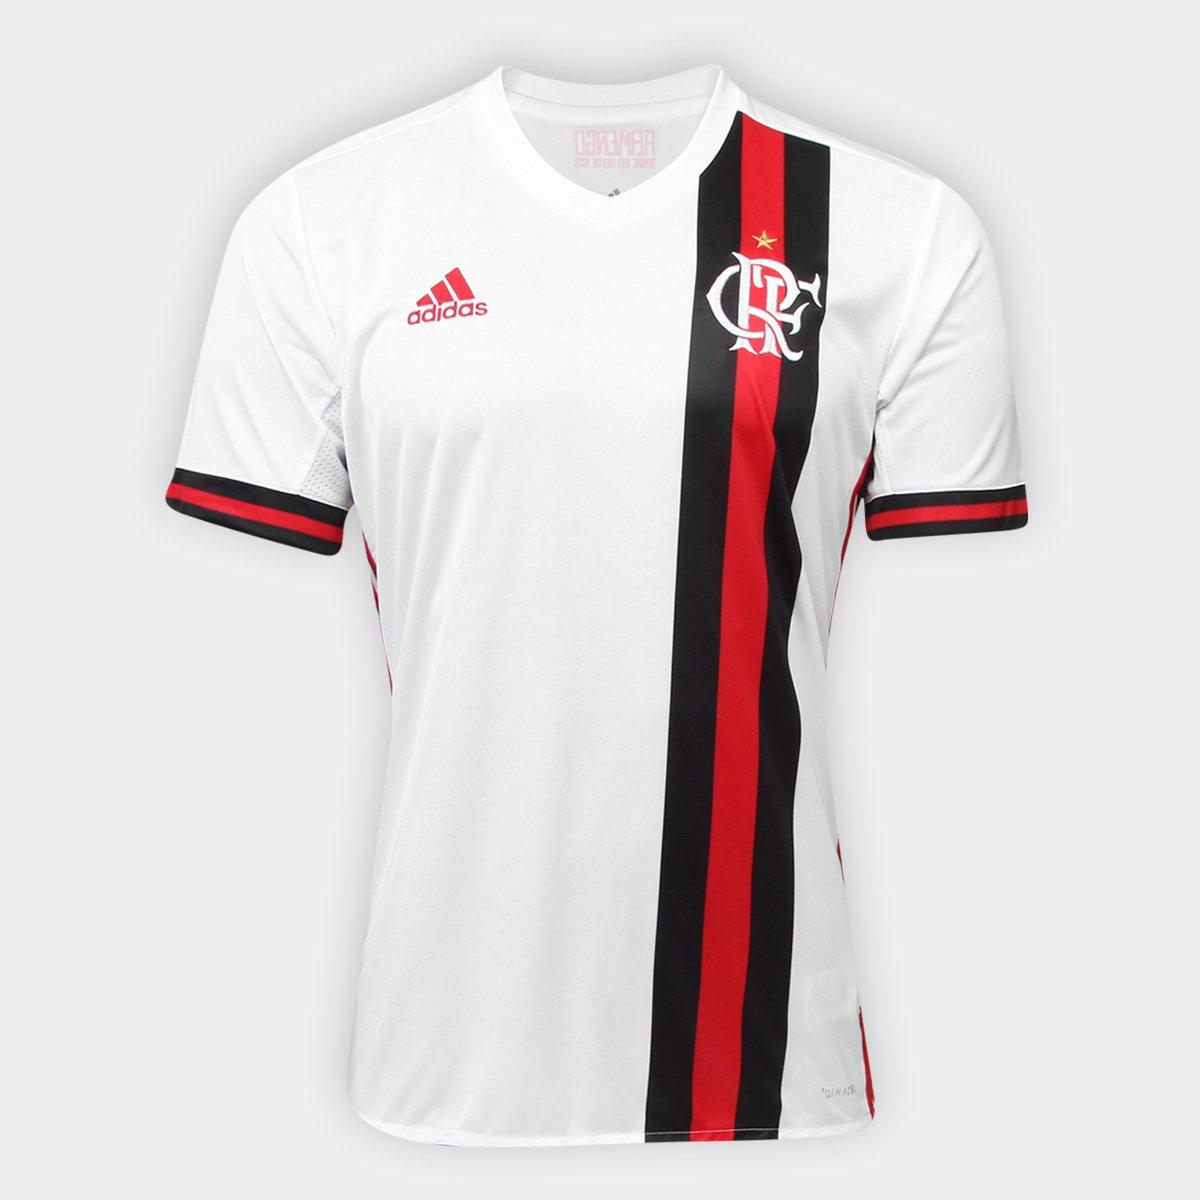 c84c3e6551013 Camisa Flamengo II 17 18 s nº Torcedor Adidas Masculina - Compre Agora